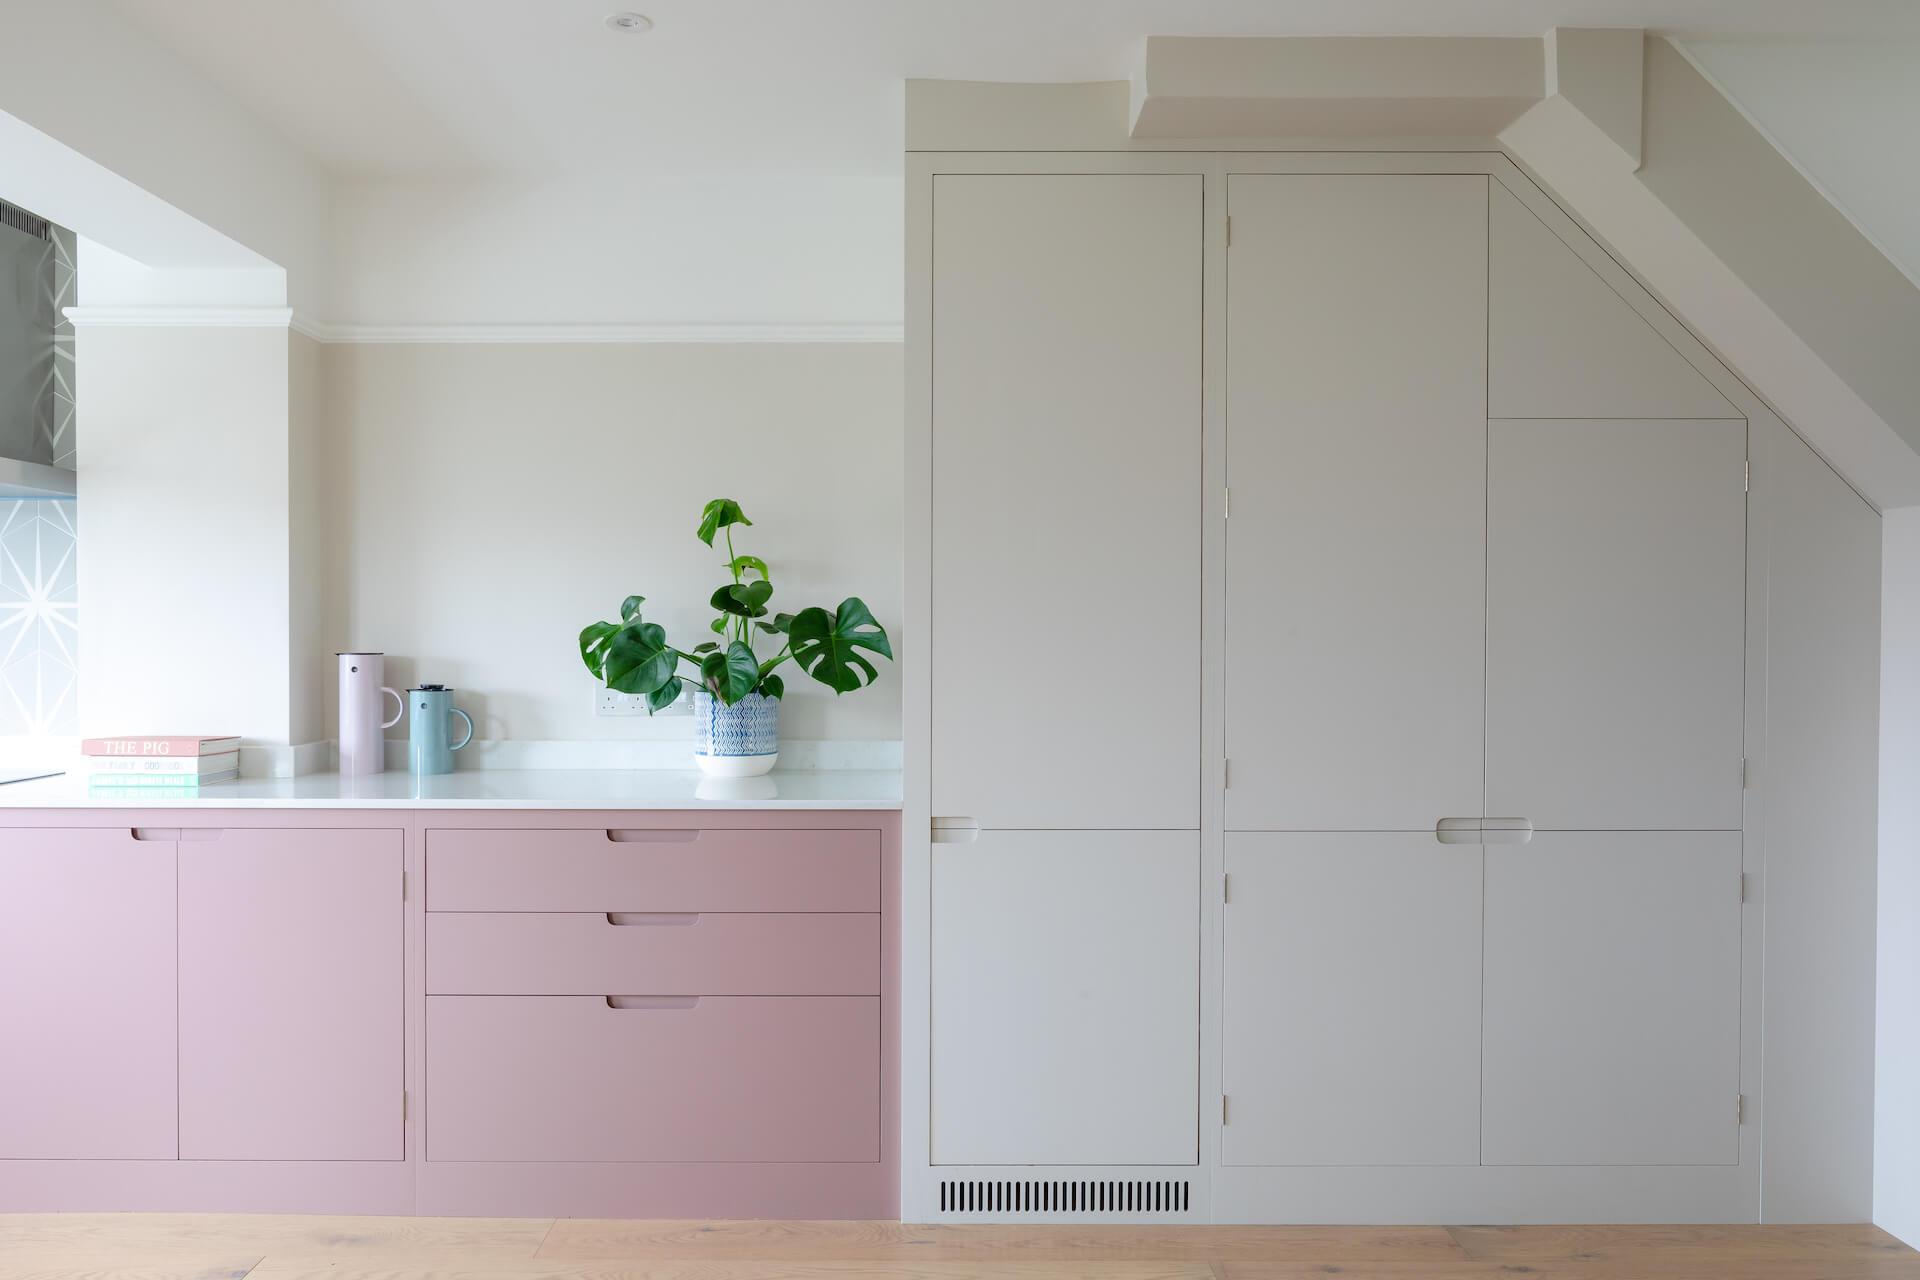 The Pink Kitchen - Sustainable Kitchens - Contemporary bespoke kitchens Bristol